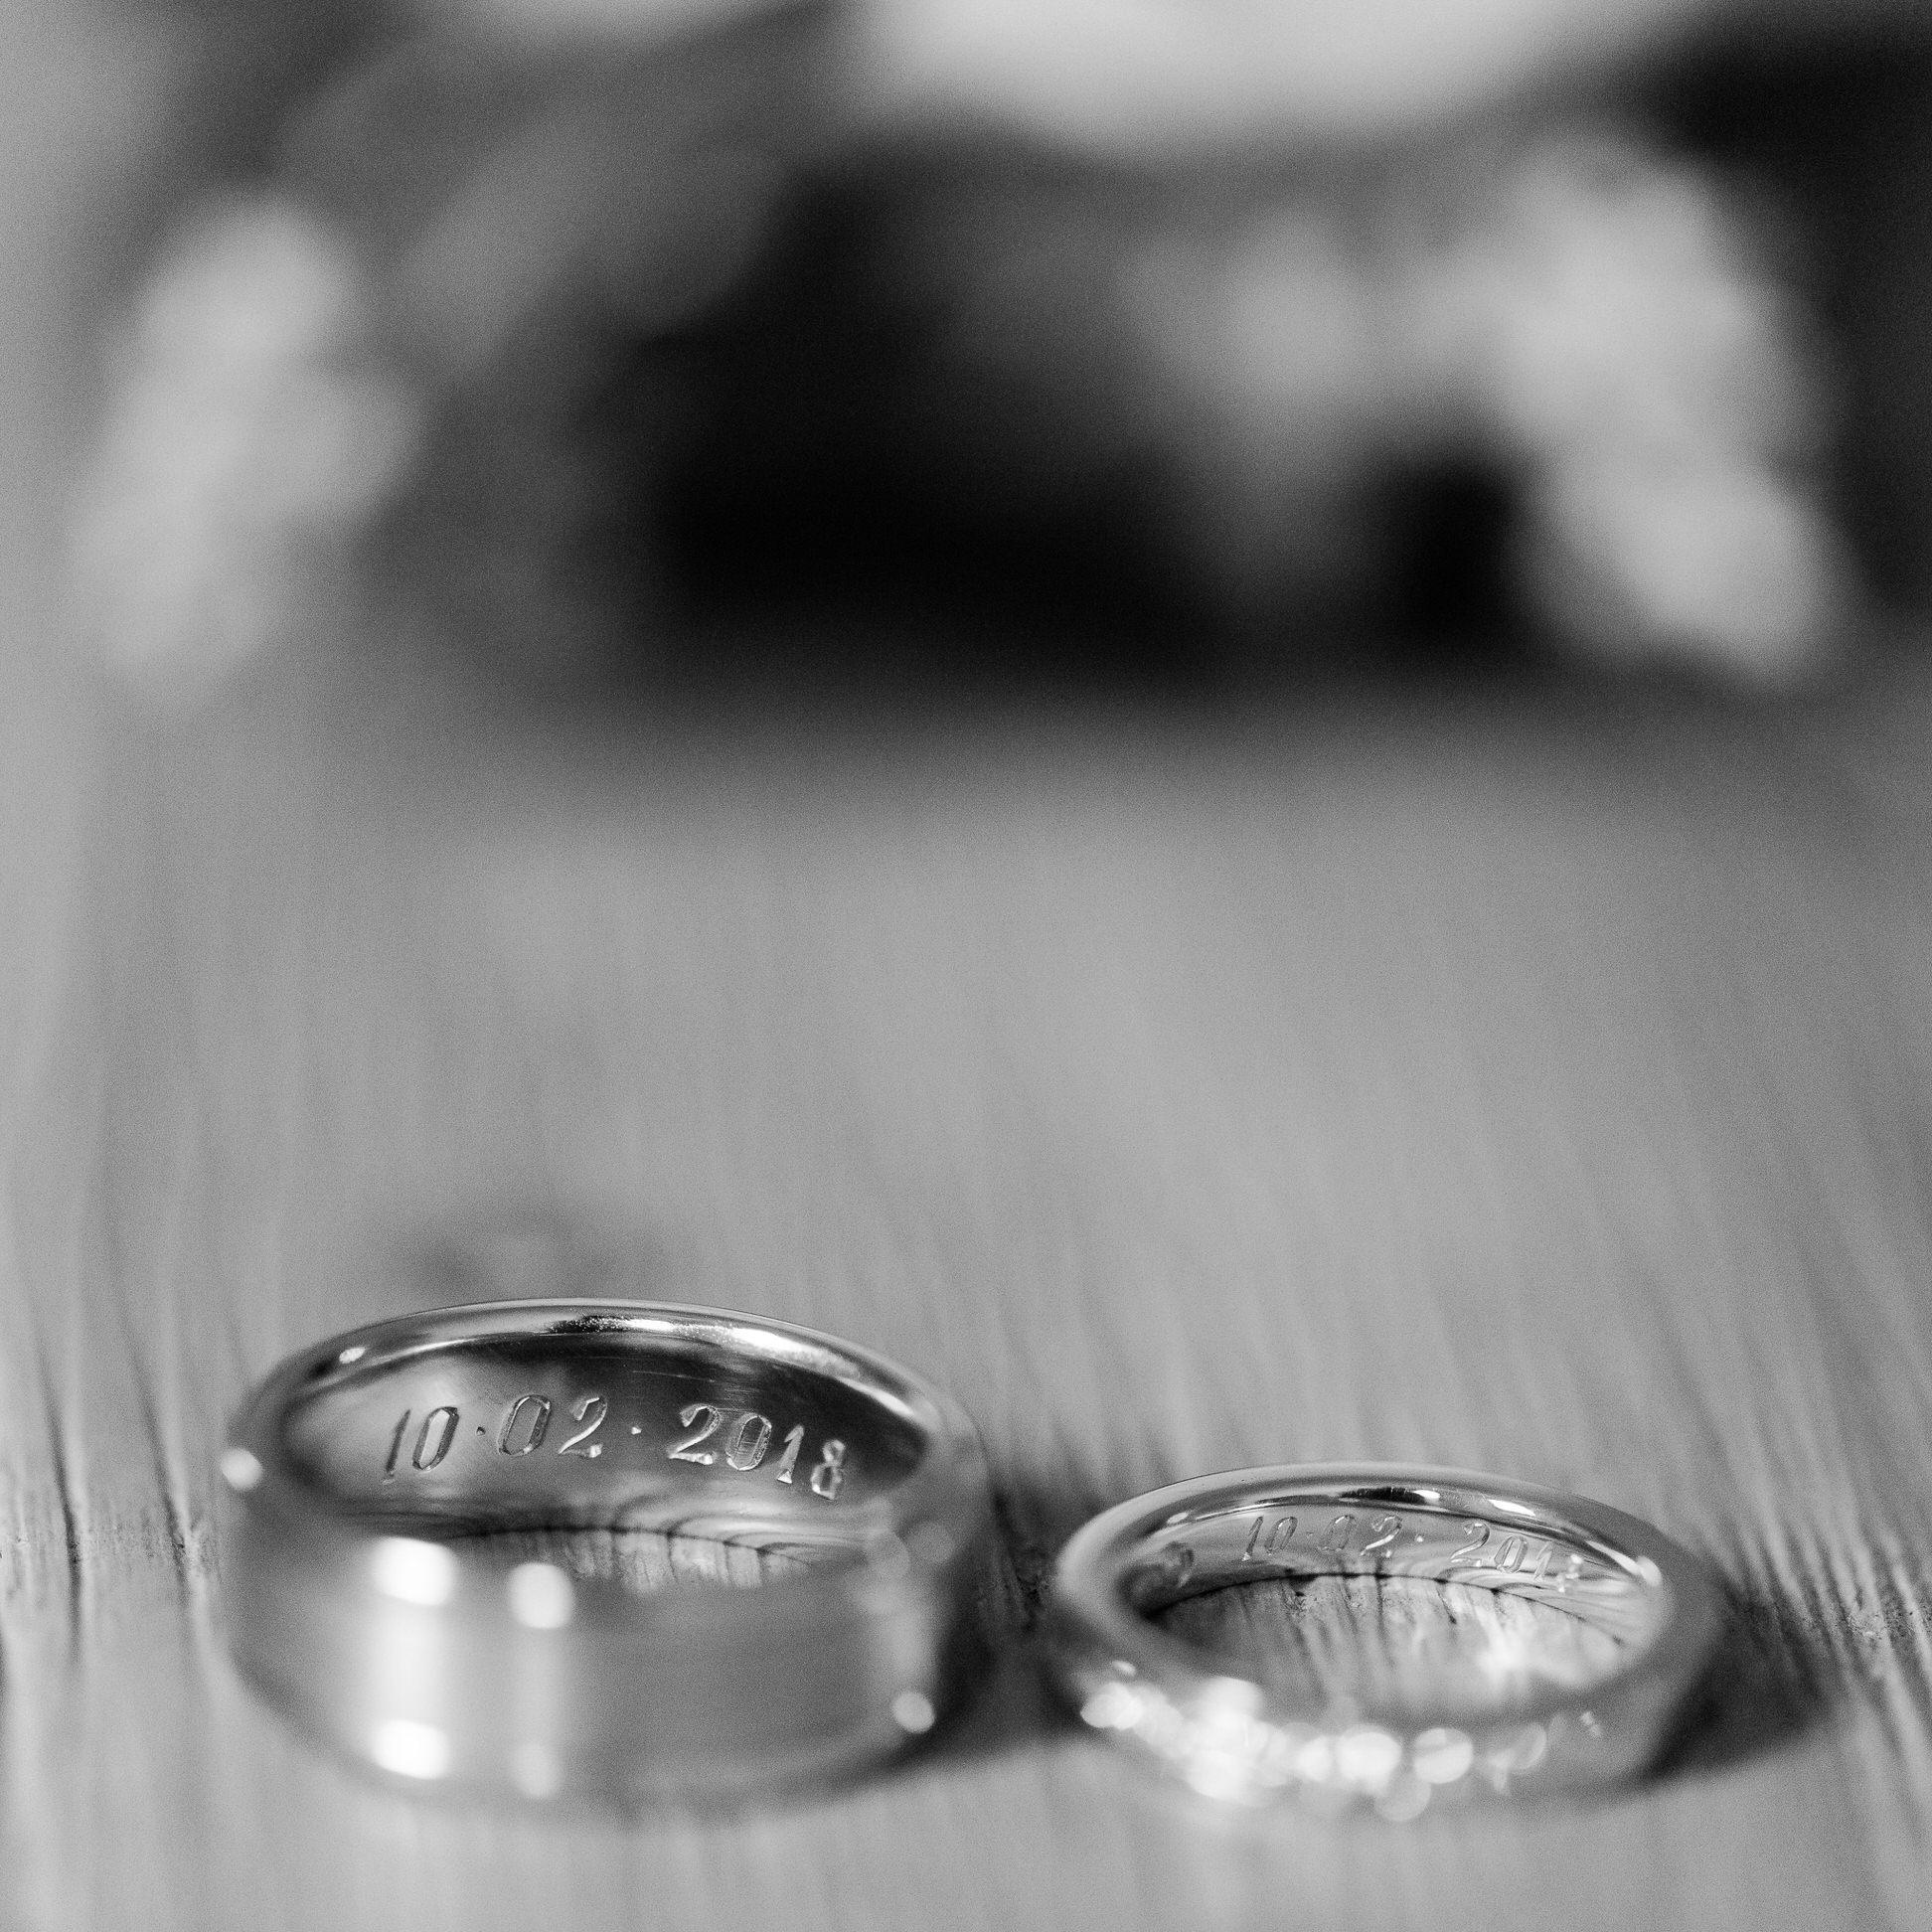 Justin_And_Jim_Photography_Chateau_Dore_Bendigo_Wedding7.JPG